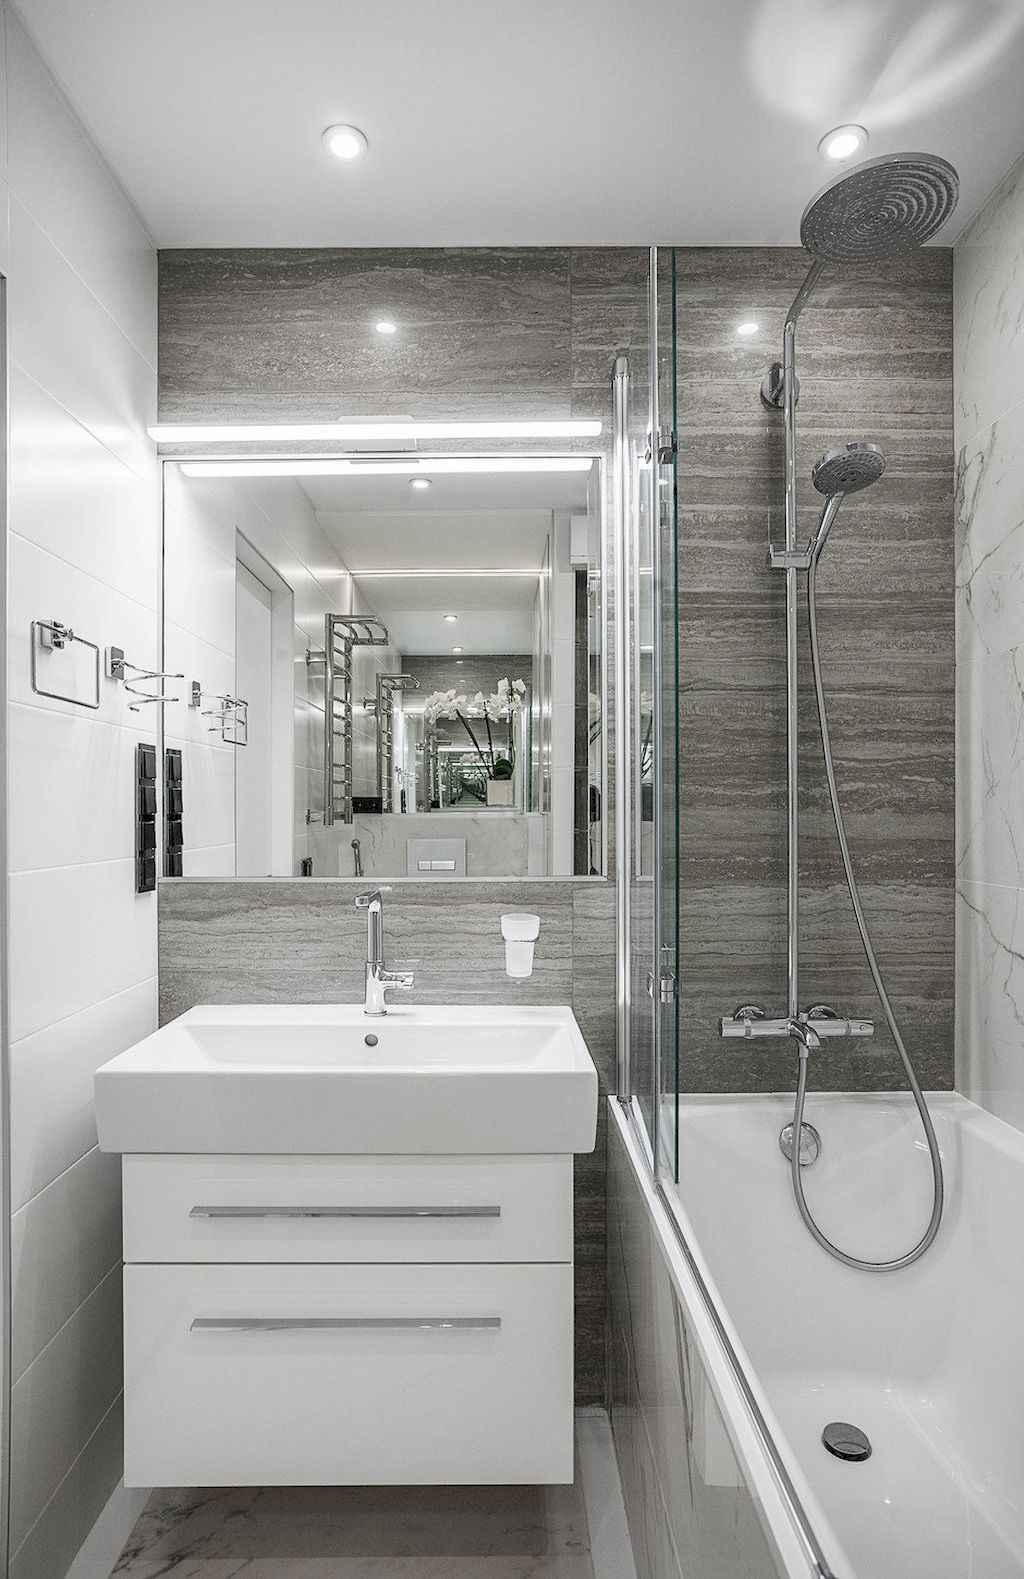 111 Brilliant Small Bathroom Remodel Ideas On A Budget (86)